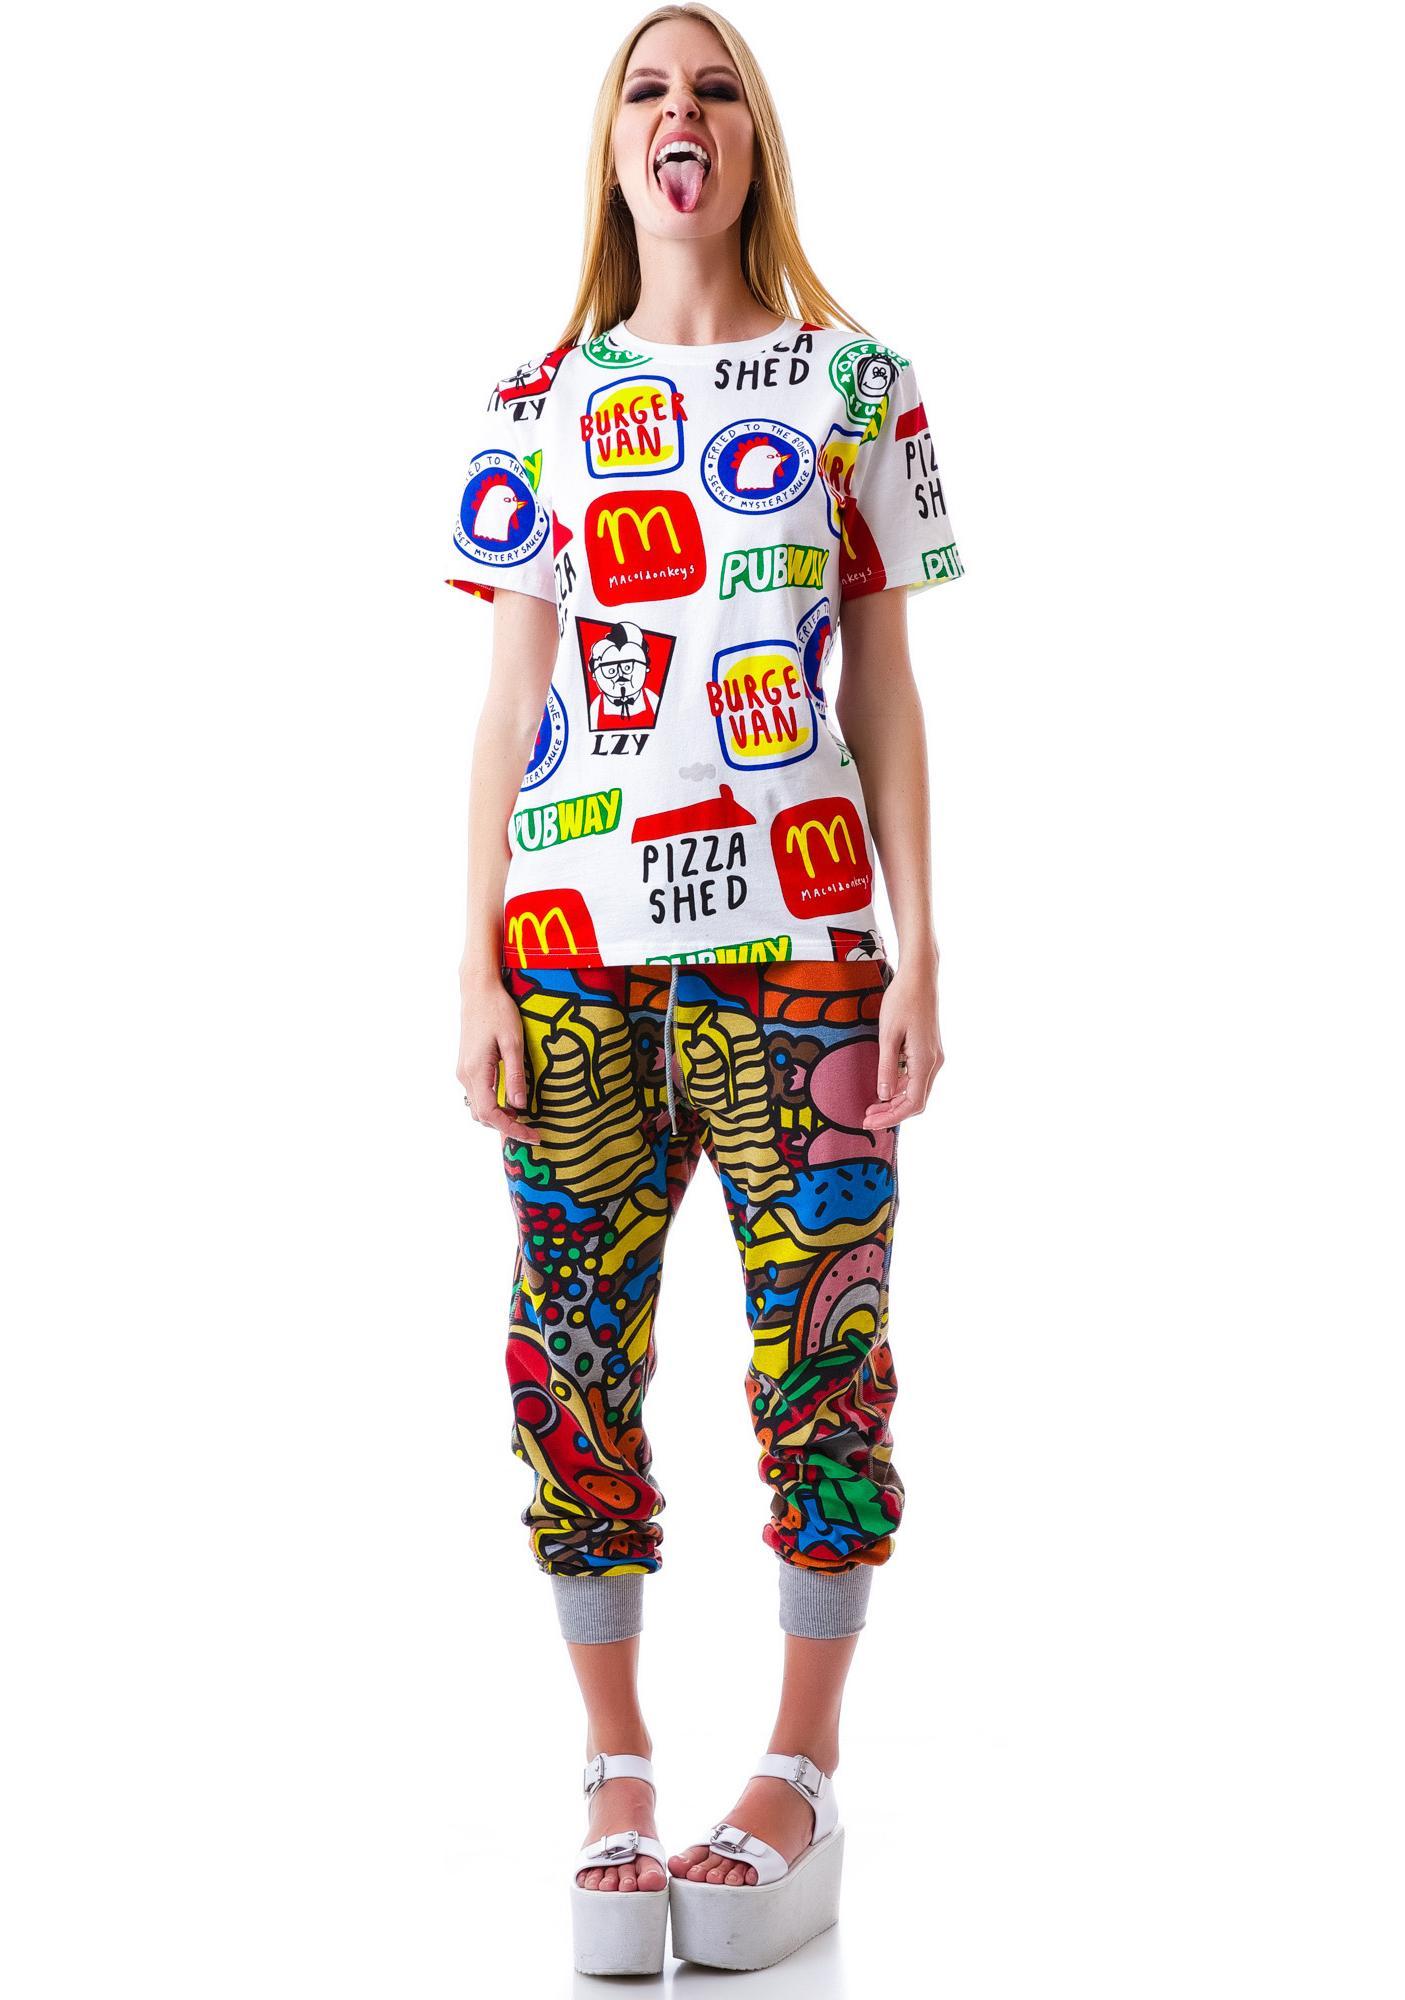 Lazy Oaf Pubway T-Shirt